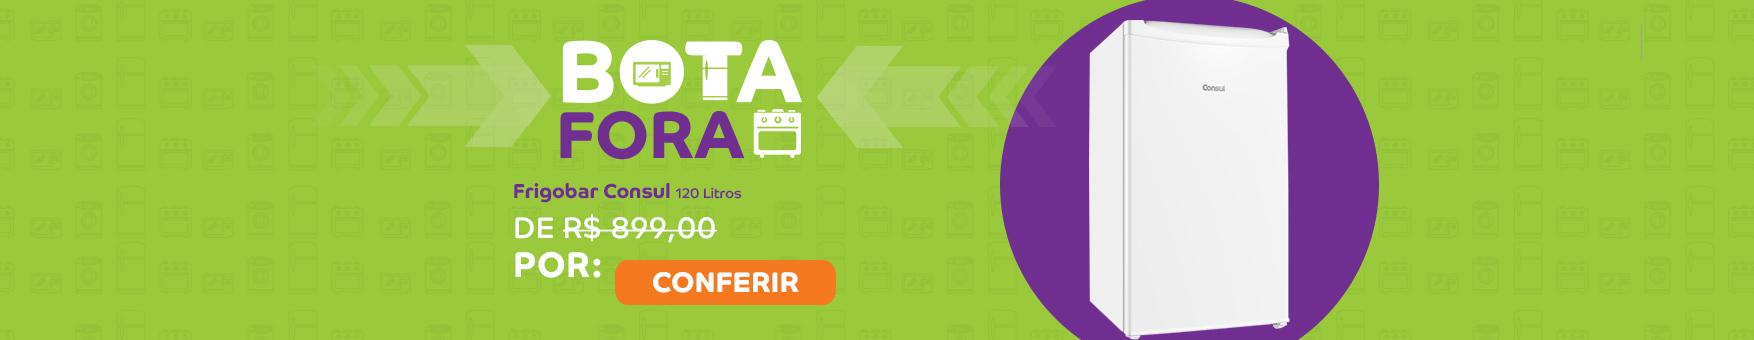 Bota Fora - CRC12AB